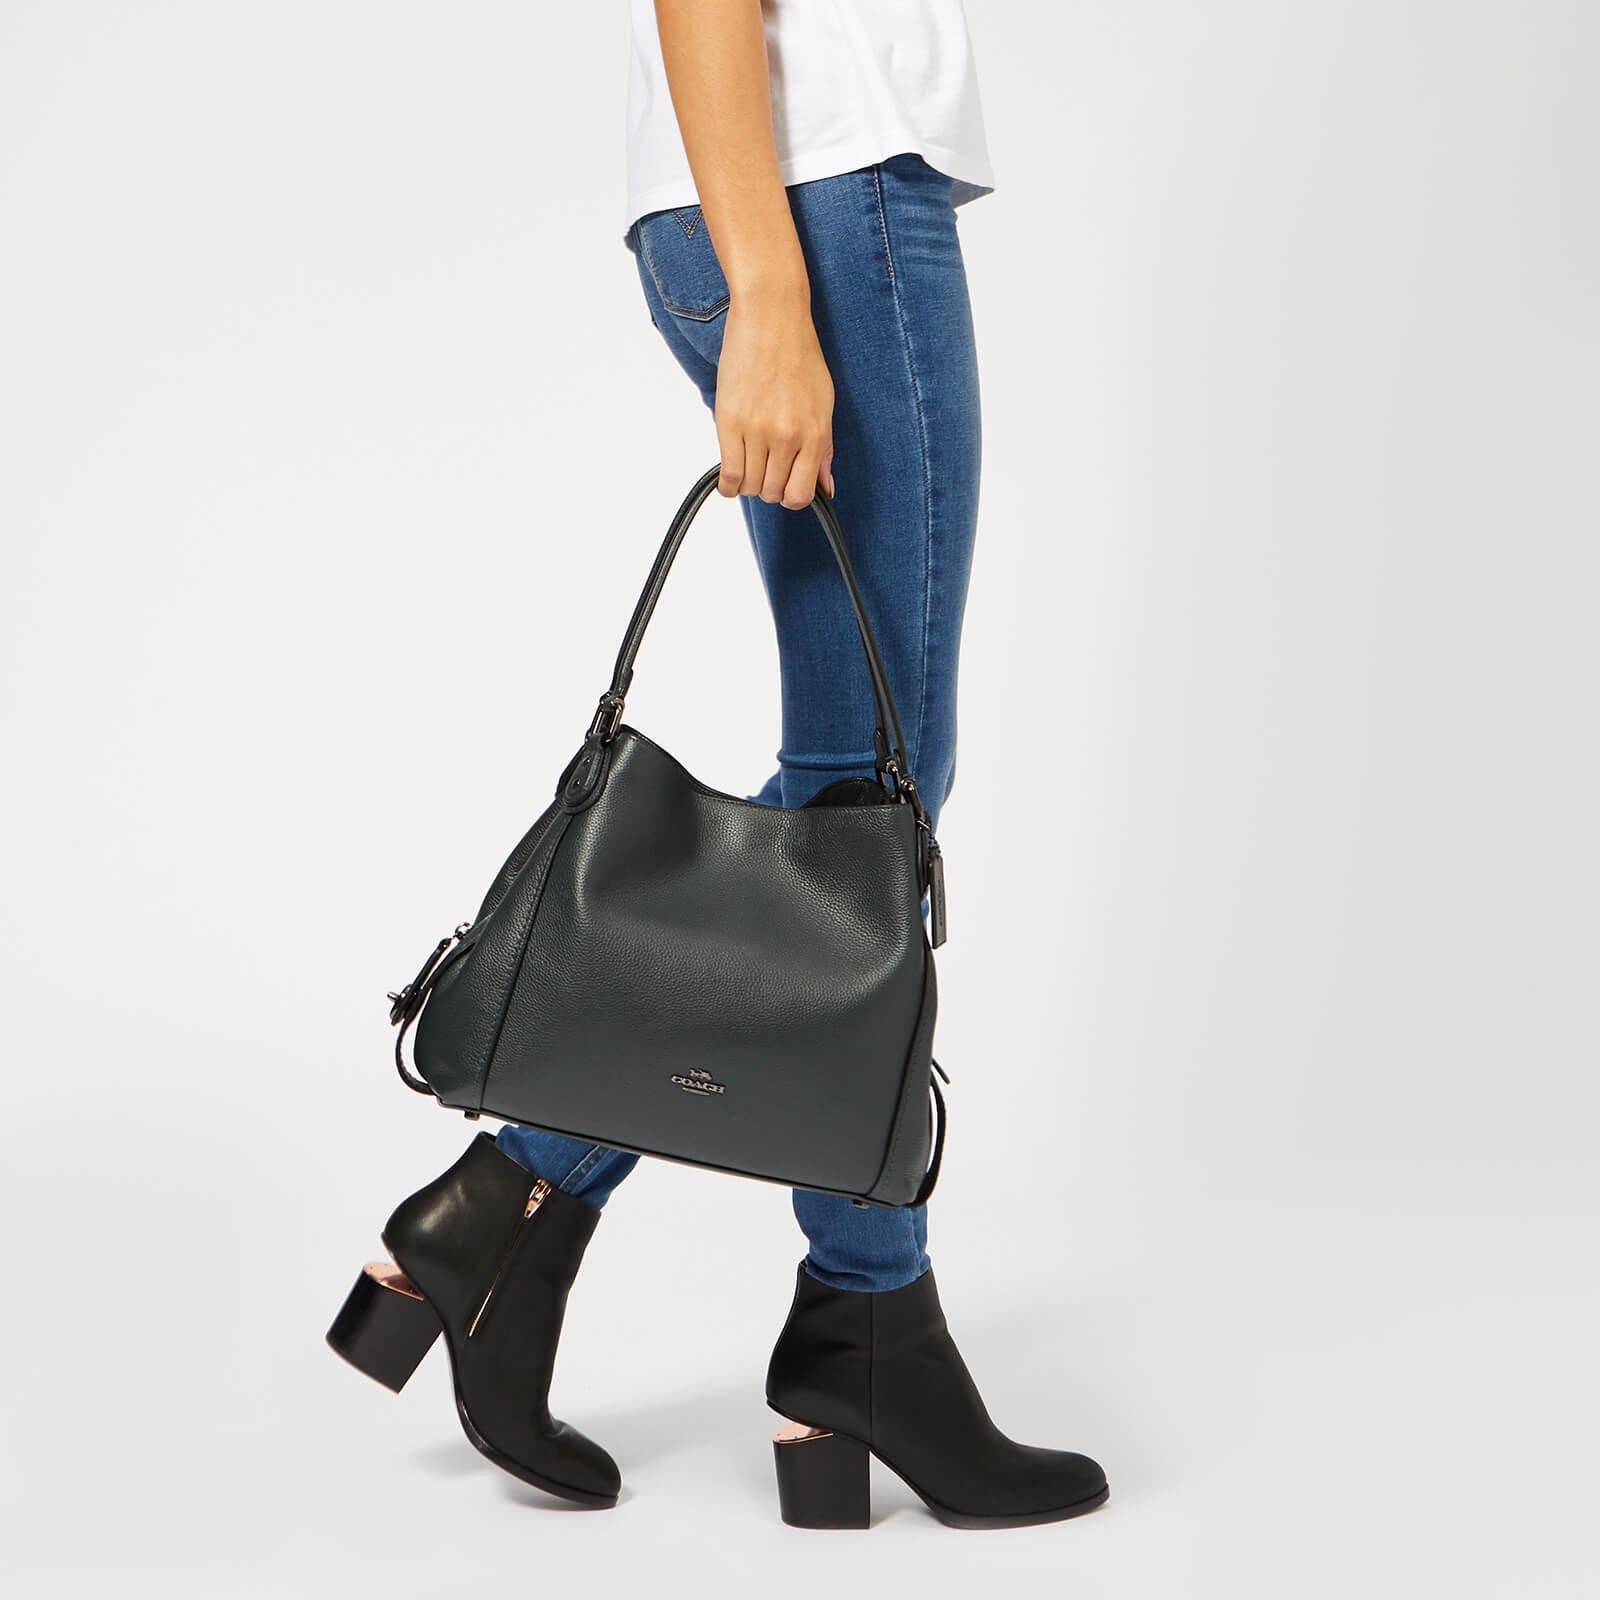 COACH - Black Polished Pebble Leather Edie 31 Shoulder Bag - Lyst. View  fullscreen 309750c65ac45